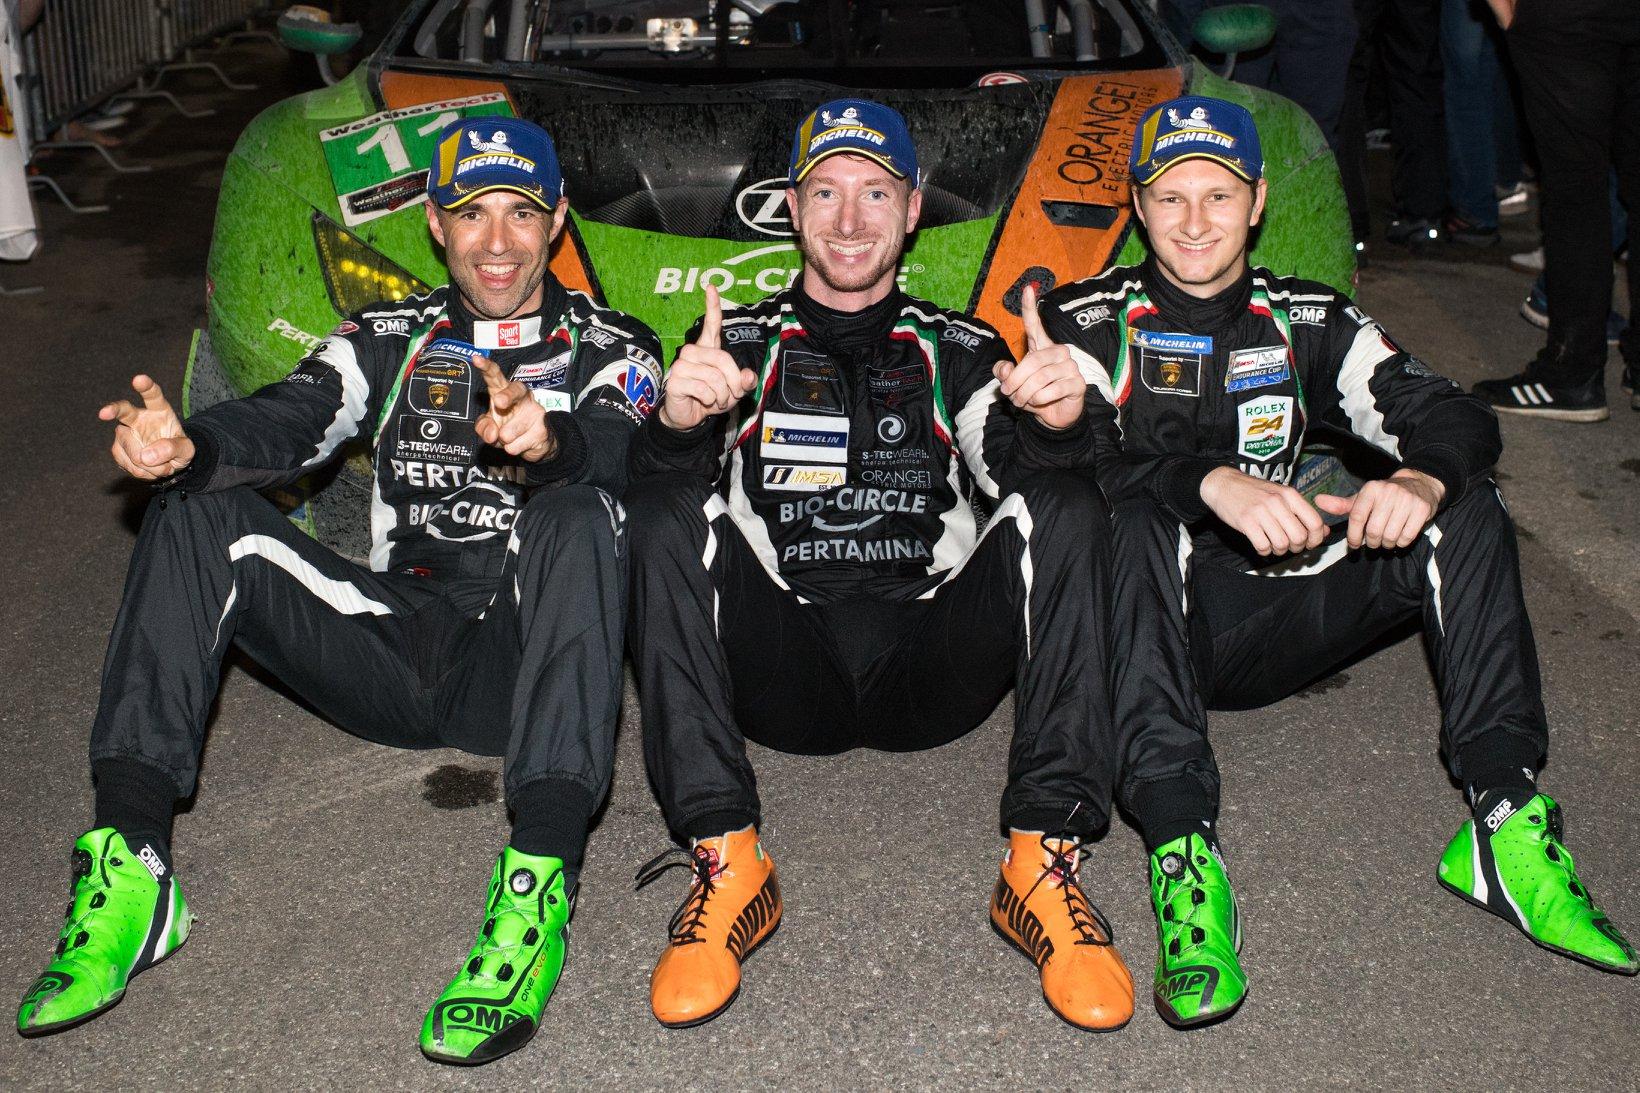 ORANGE1 TEAM GRT with sensational win in 12 hours of Sebring